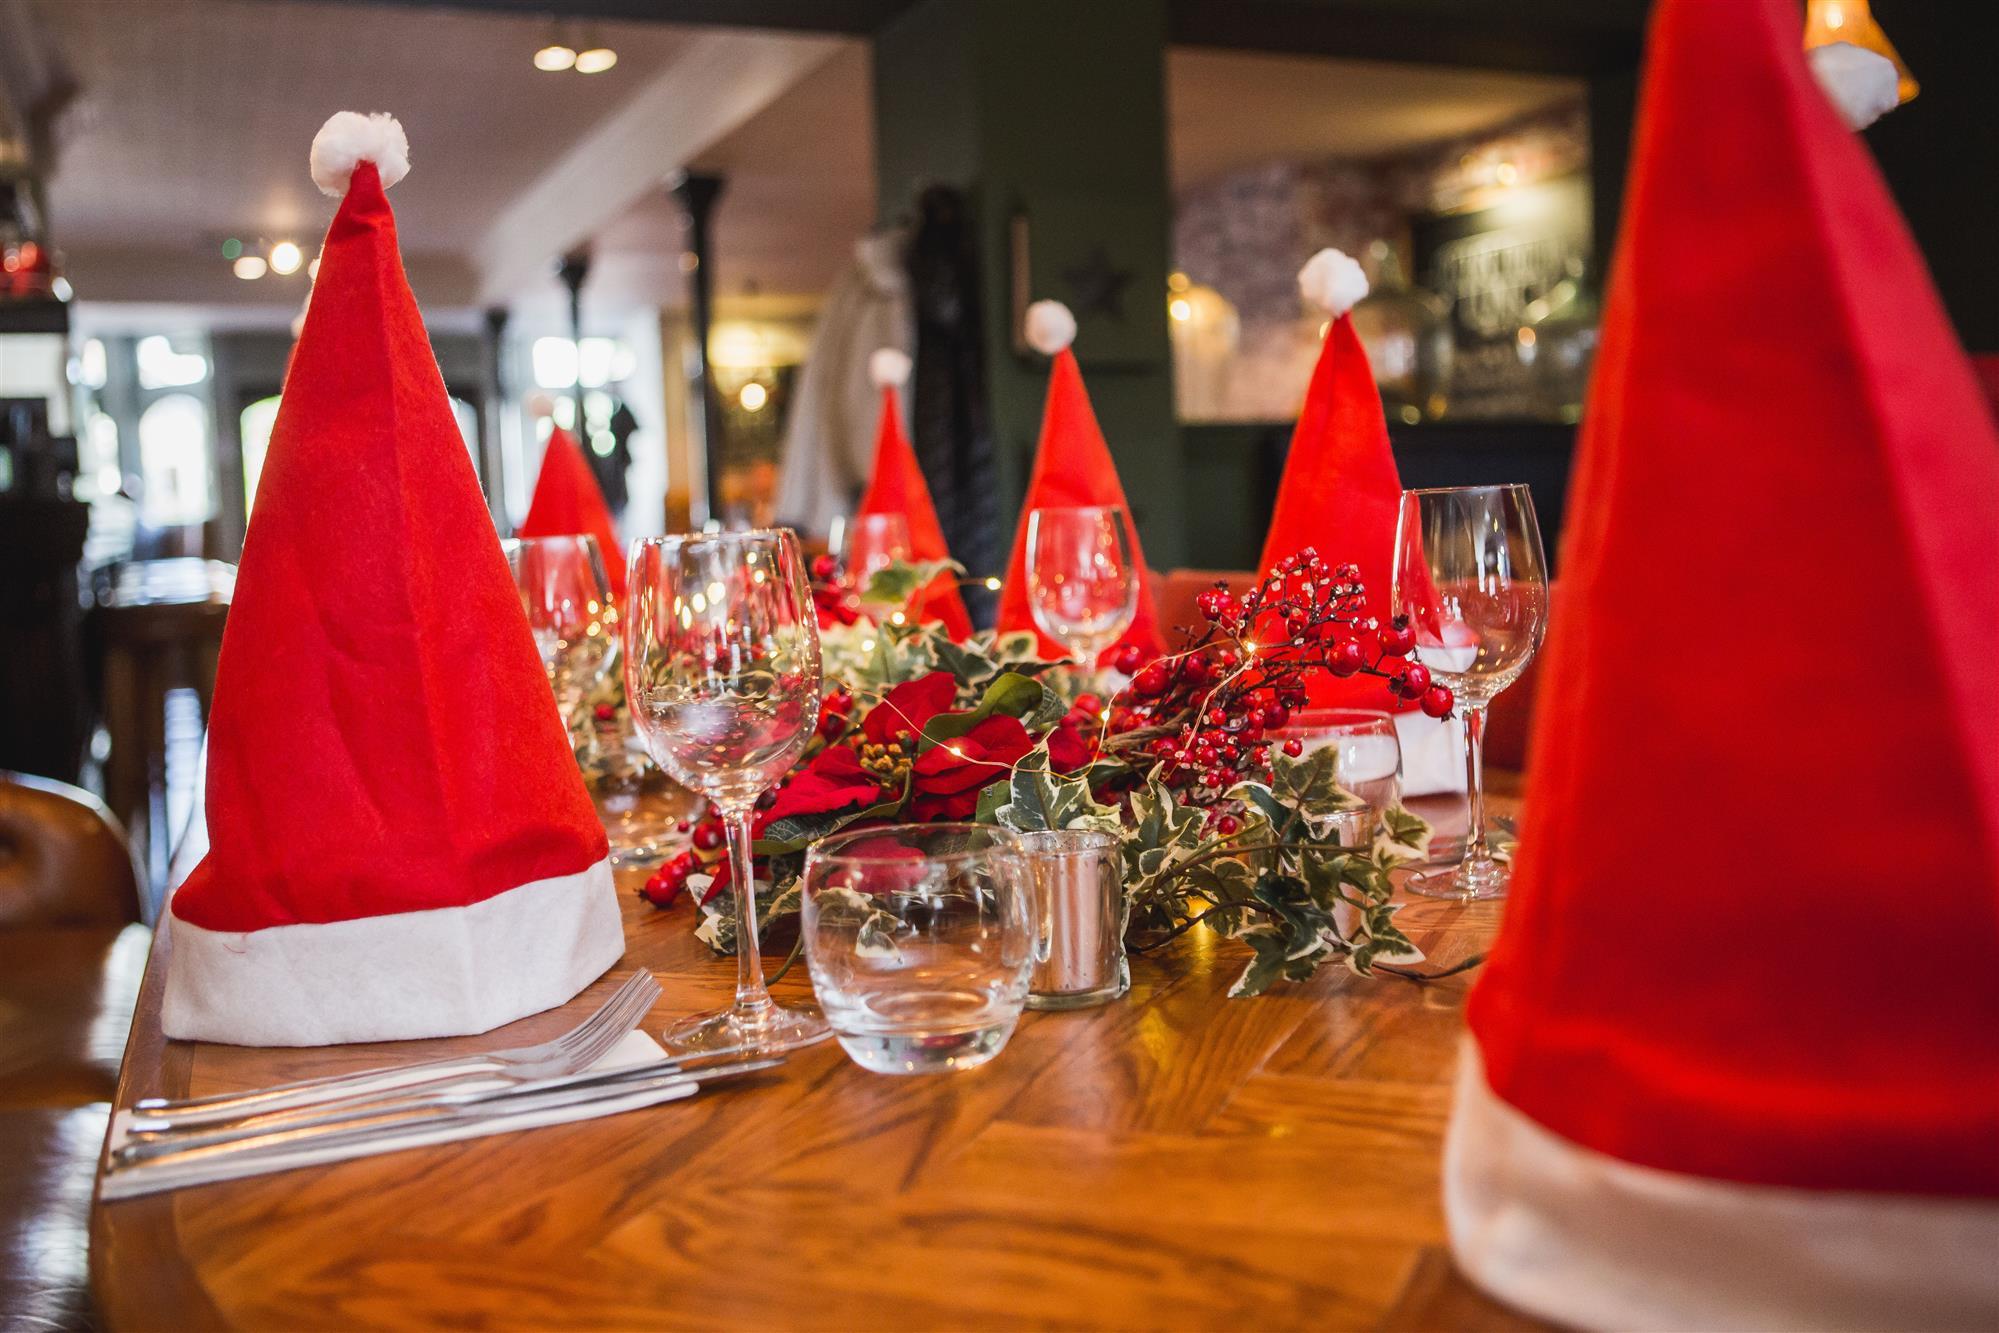 Hospitality Work During Christmas